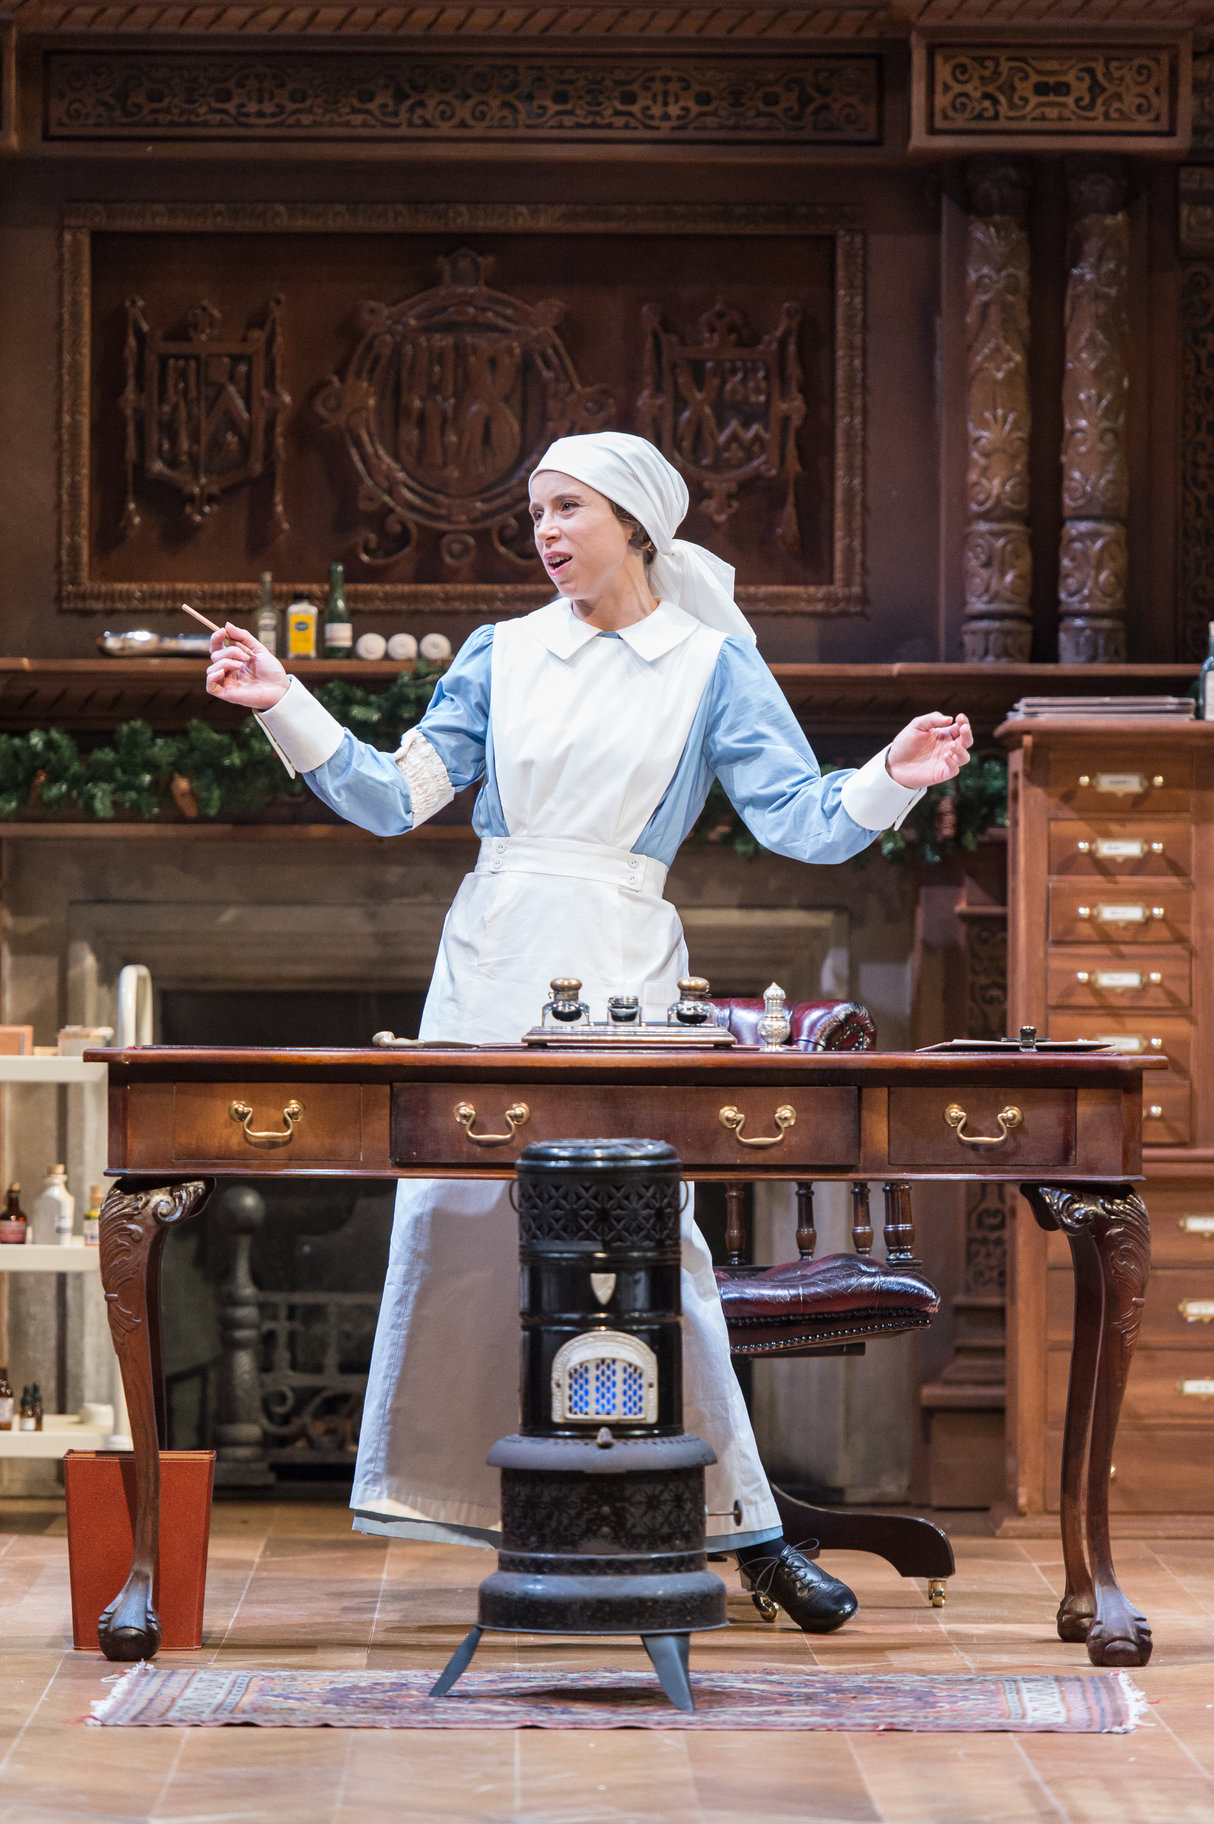 Beatrice in her nurse's uniform stands behind a wooden desk.